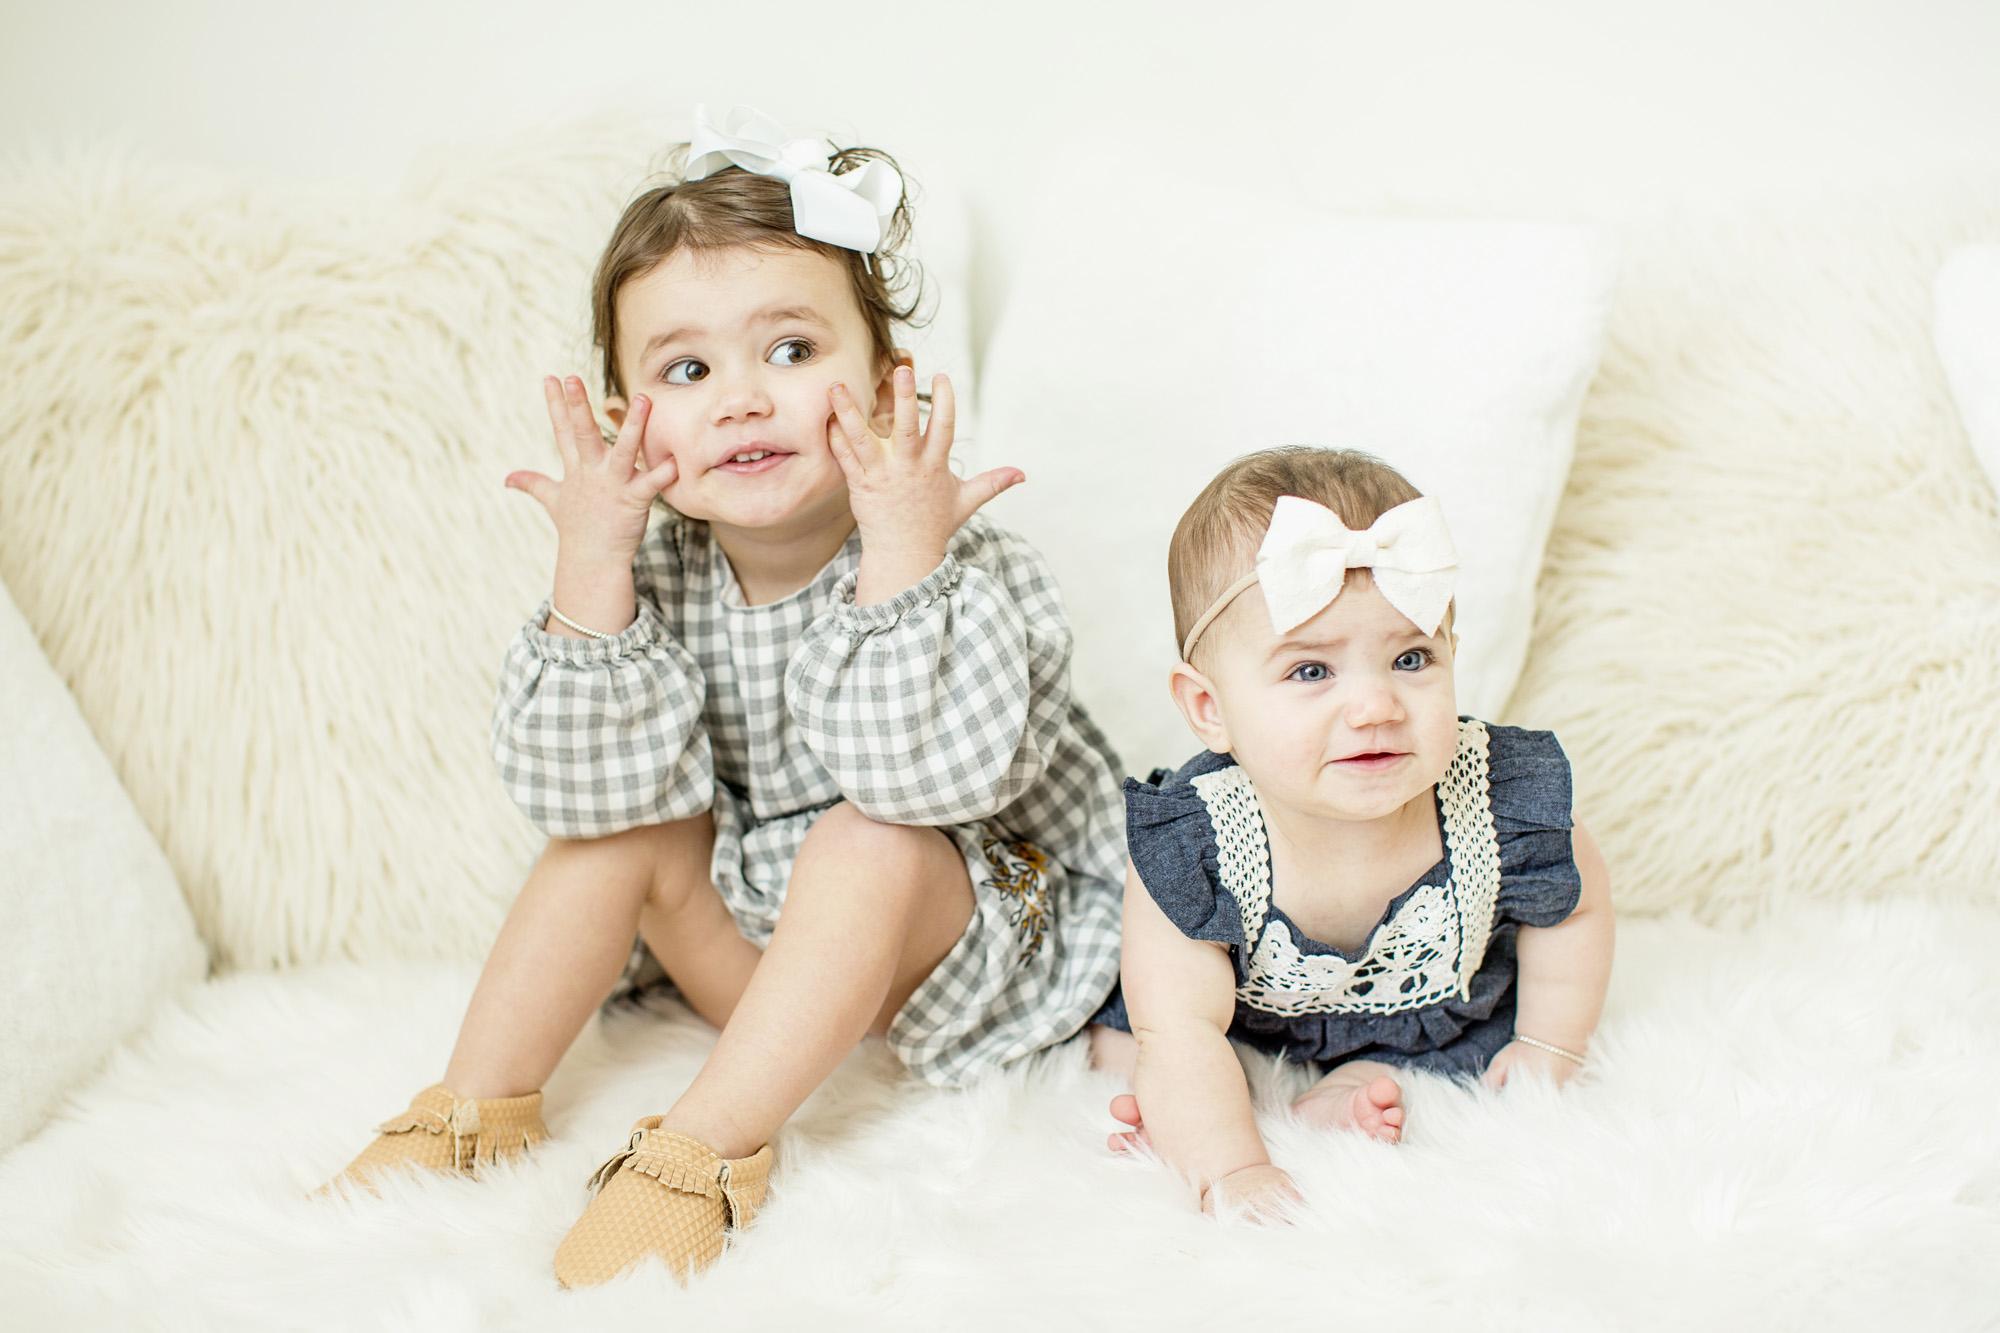 Seriously_Sabrina_Photography_Lexington_Kentucky_Studio_Lex_Portraits_Family_Oyler3.jpg